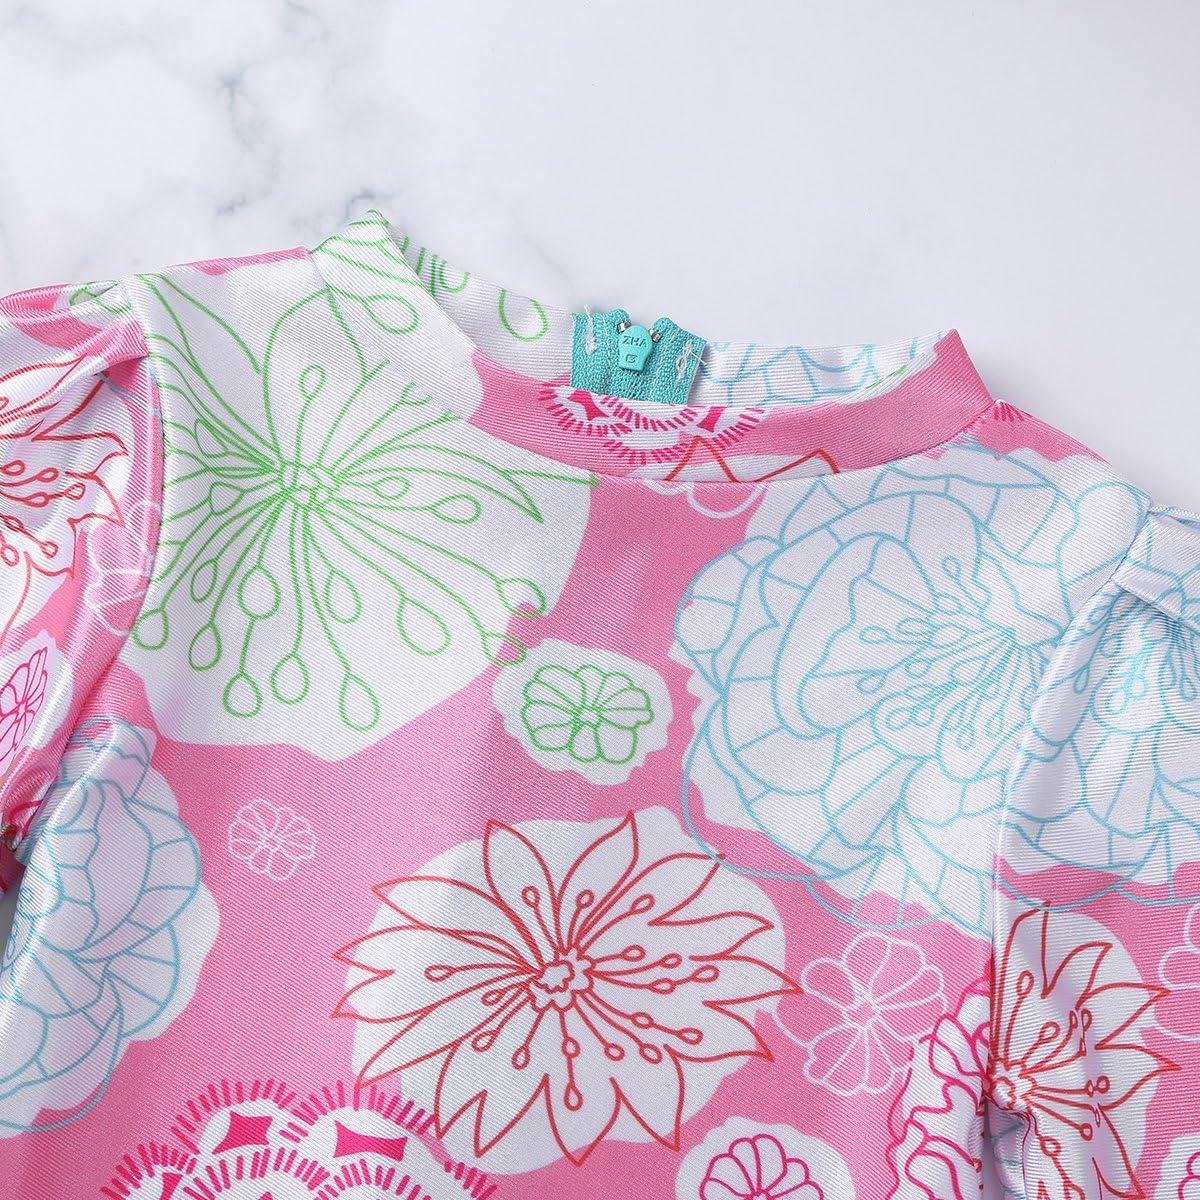 Agoky Baby//Toddler Girls Long Sleeve Rash Guard 2-Piece Swimsuit Set Floral UPF 50 Sun Protection Bodysuit Swimwear